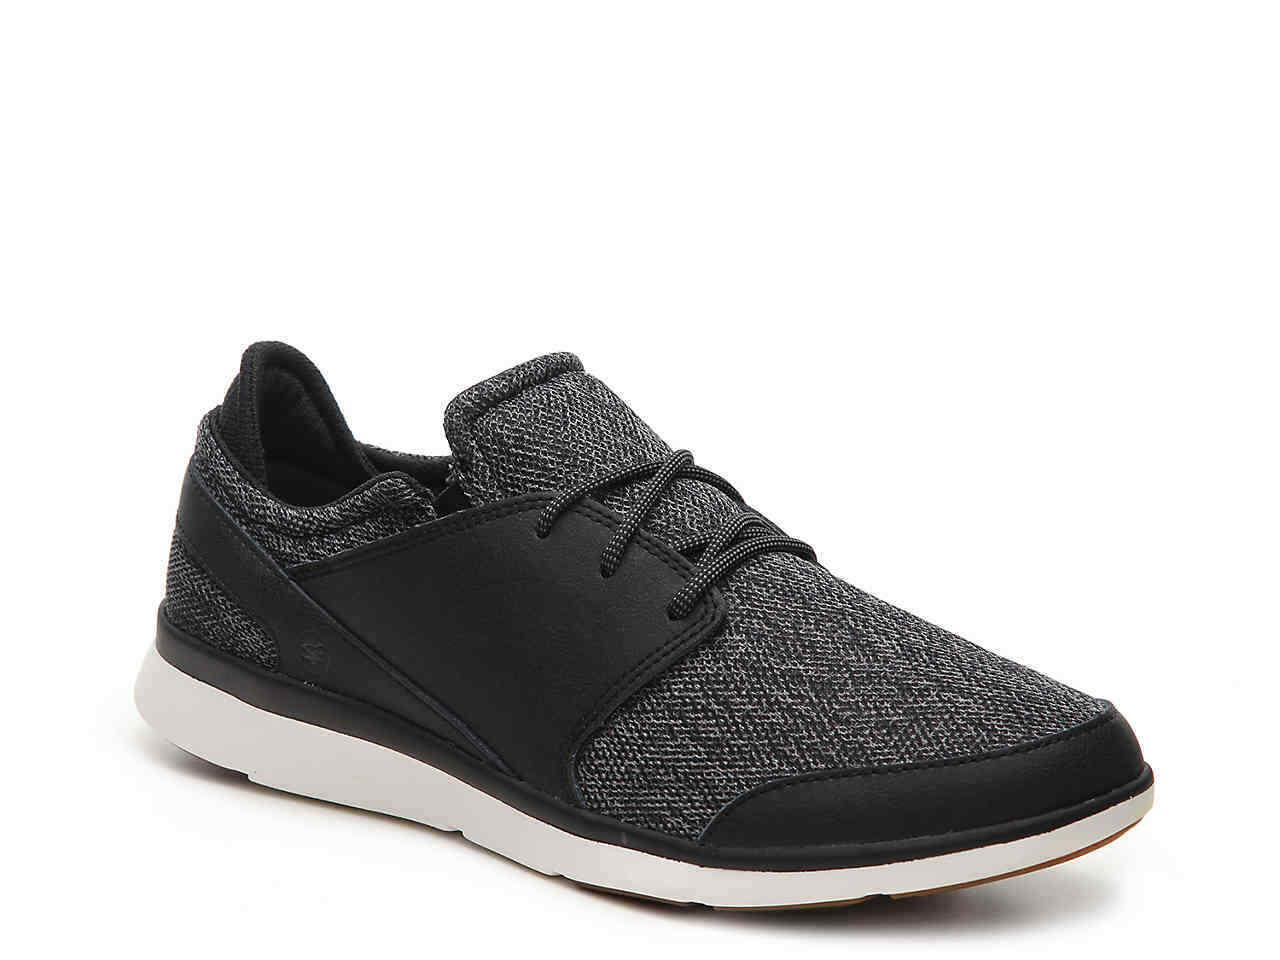 Superfeet SHAW Mens Black Mesh Lace Up Comfort Walking Sneaker shoes